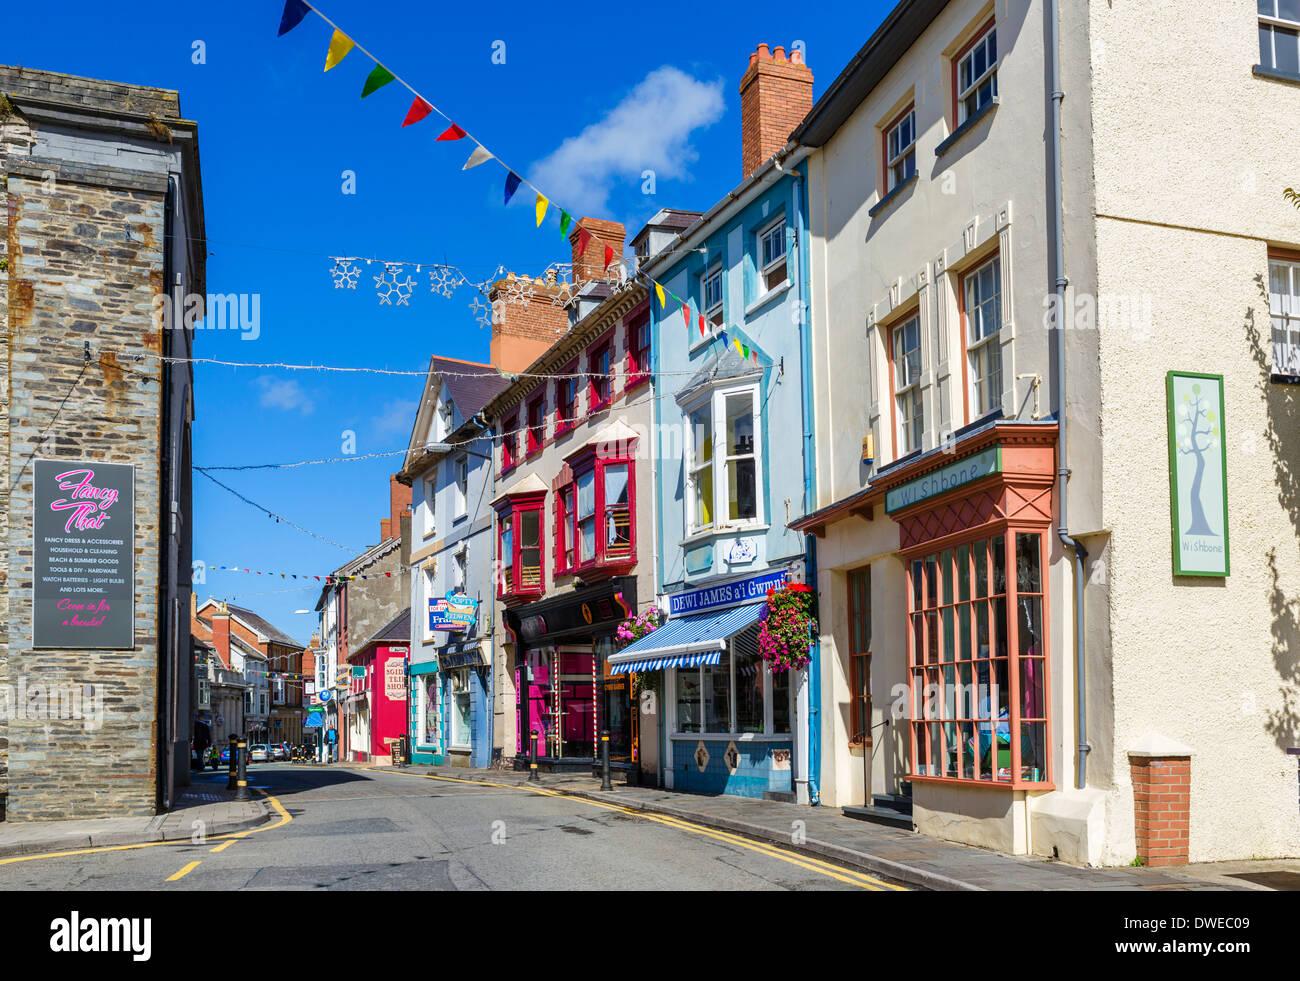 Shops on the High Street, Cardigan, Ceredigion, Wales, UK - Stock Image